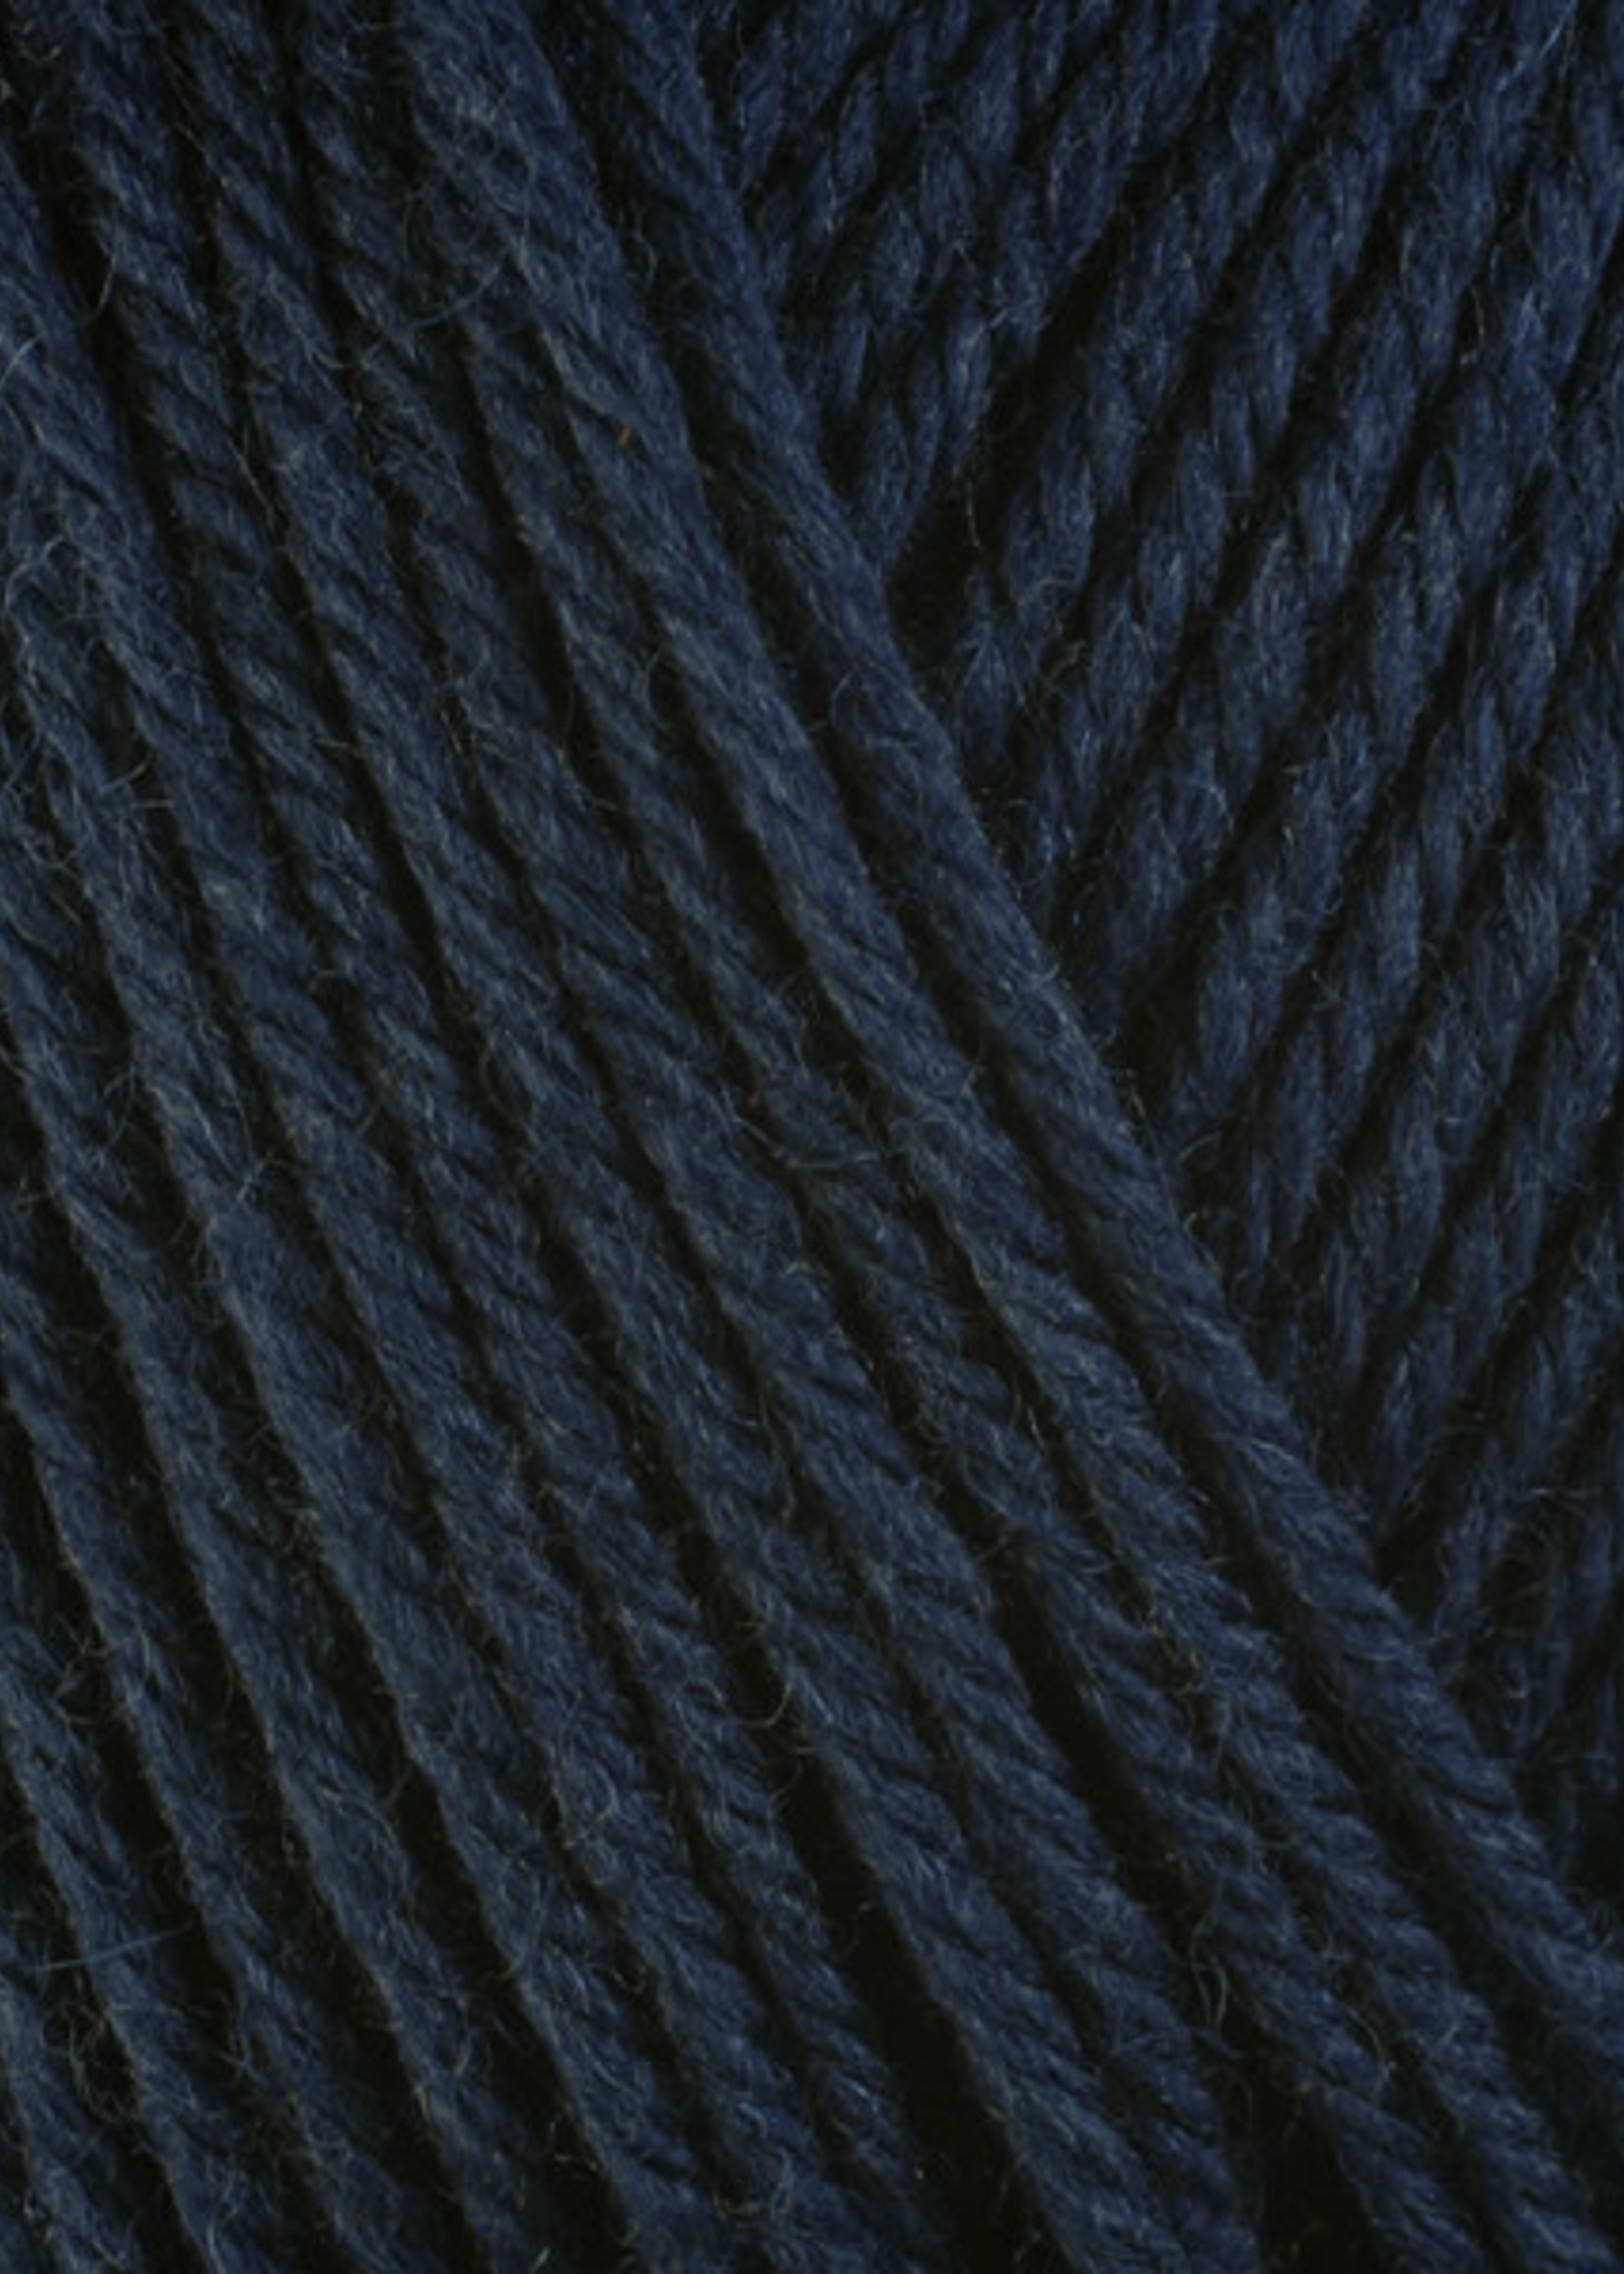 Berroco Berroco Ultra Wool 3363 Navy